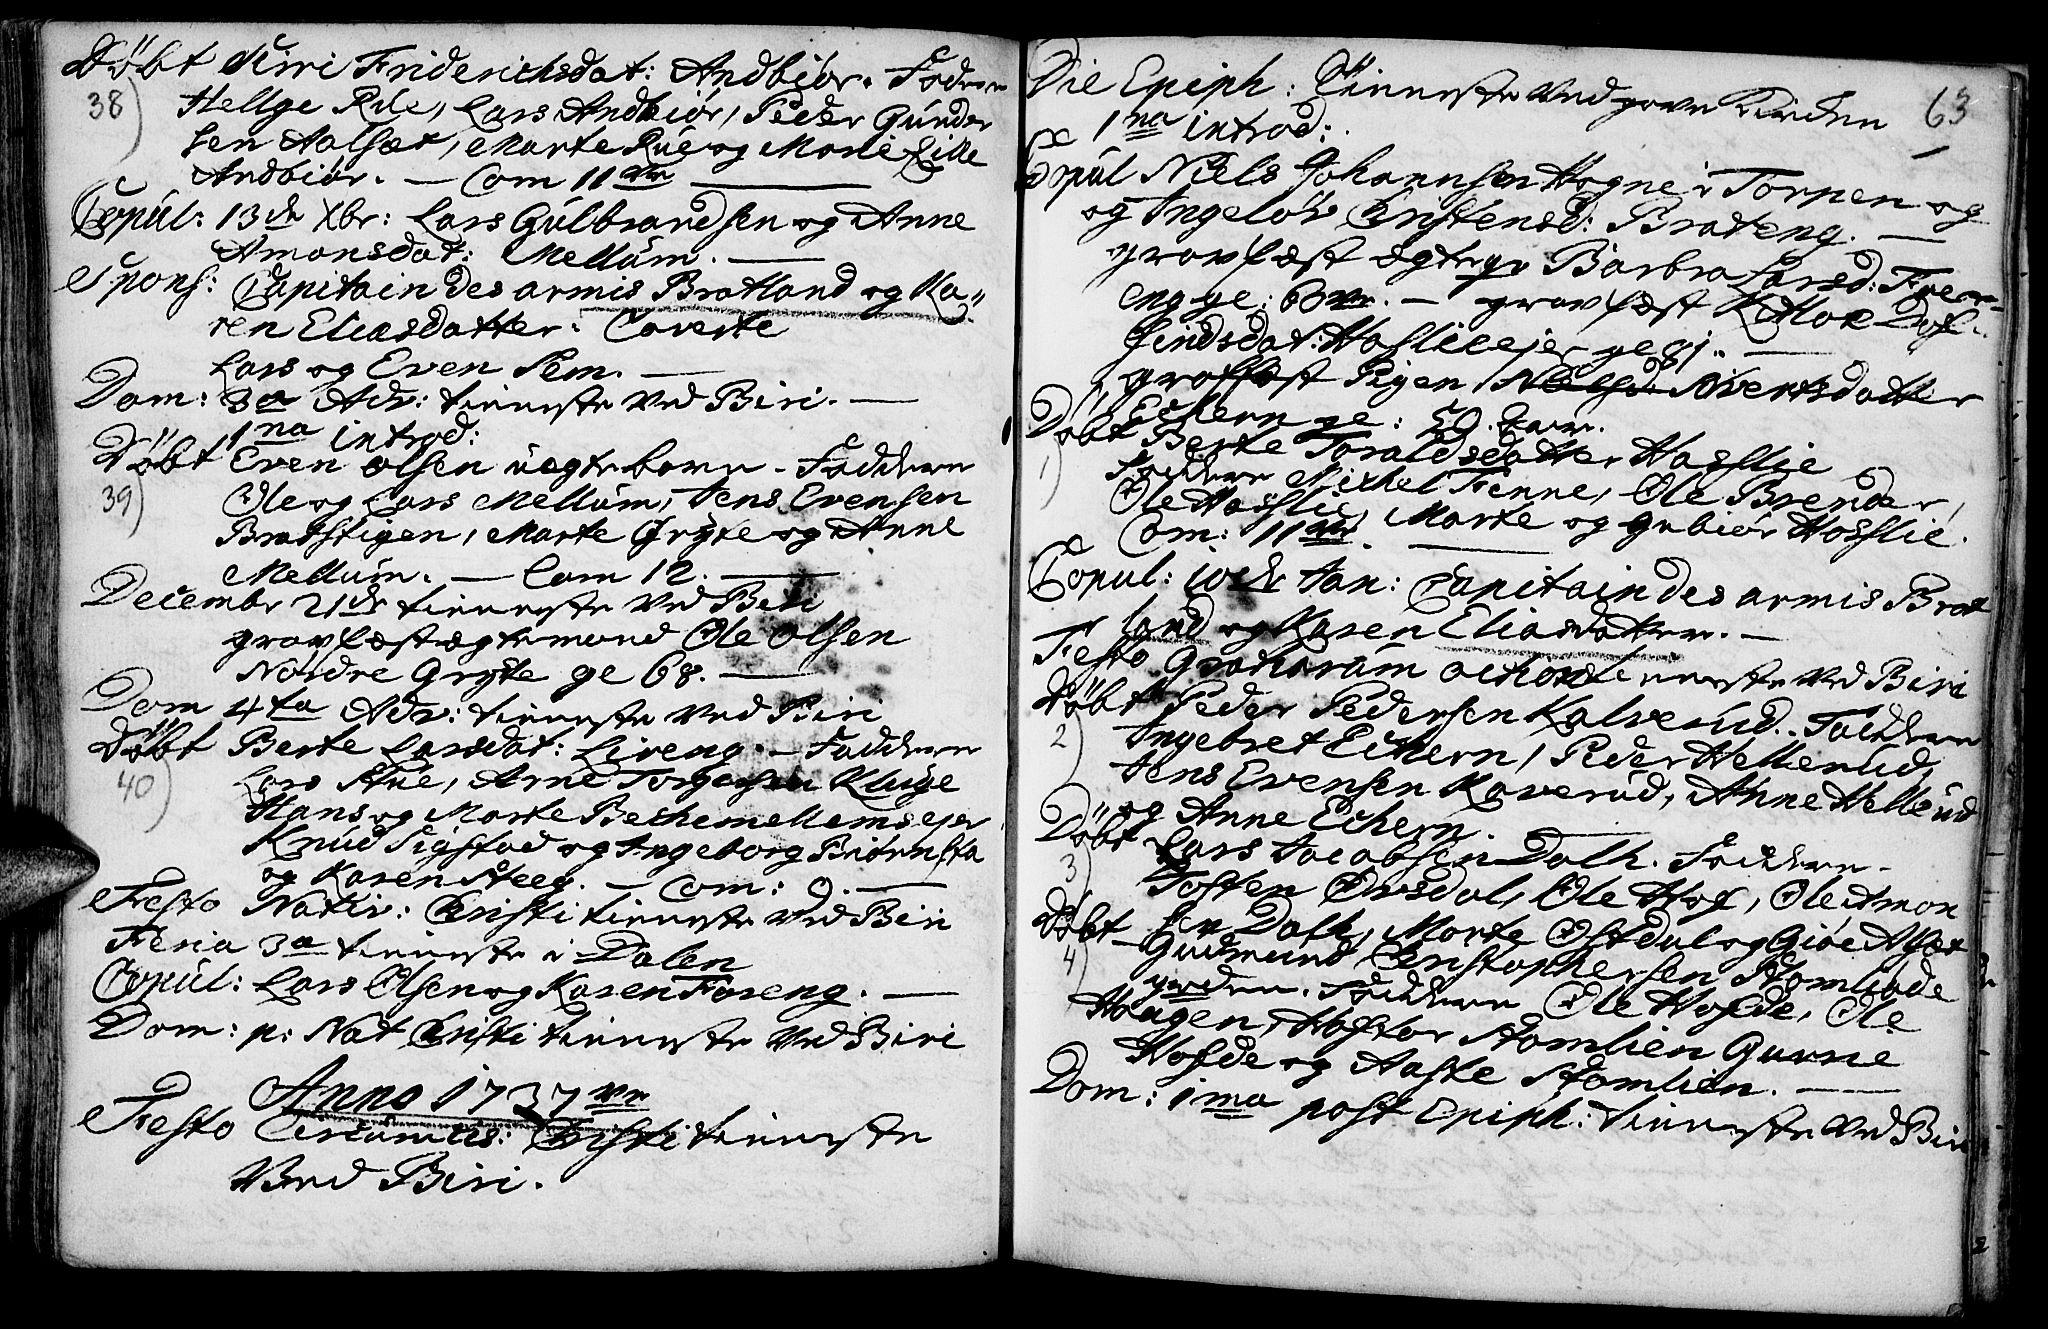 SAH, Biri prestekontor, Ministerialbok nr. 1, 1730-1754, s. 63